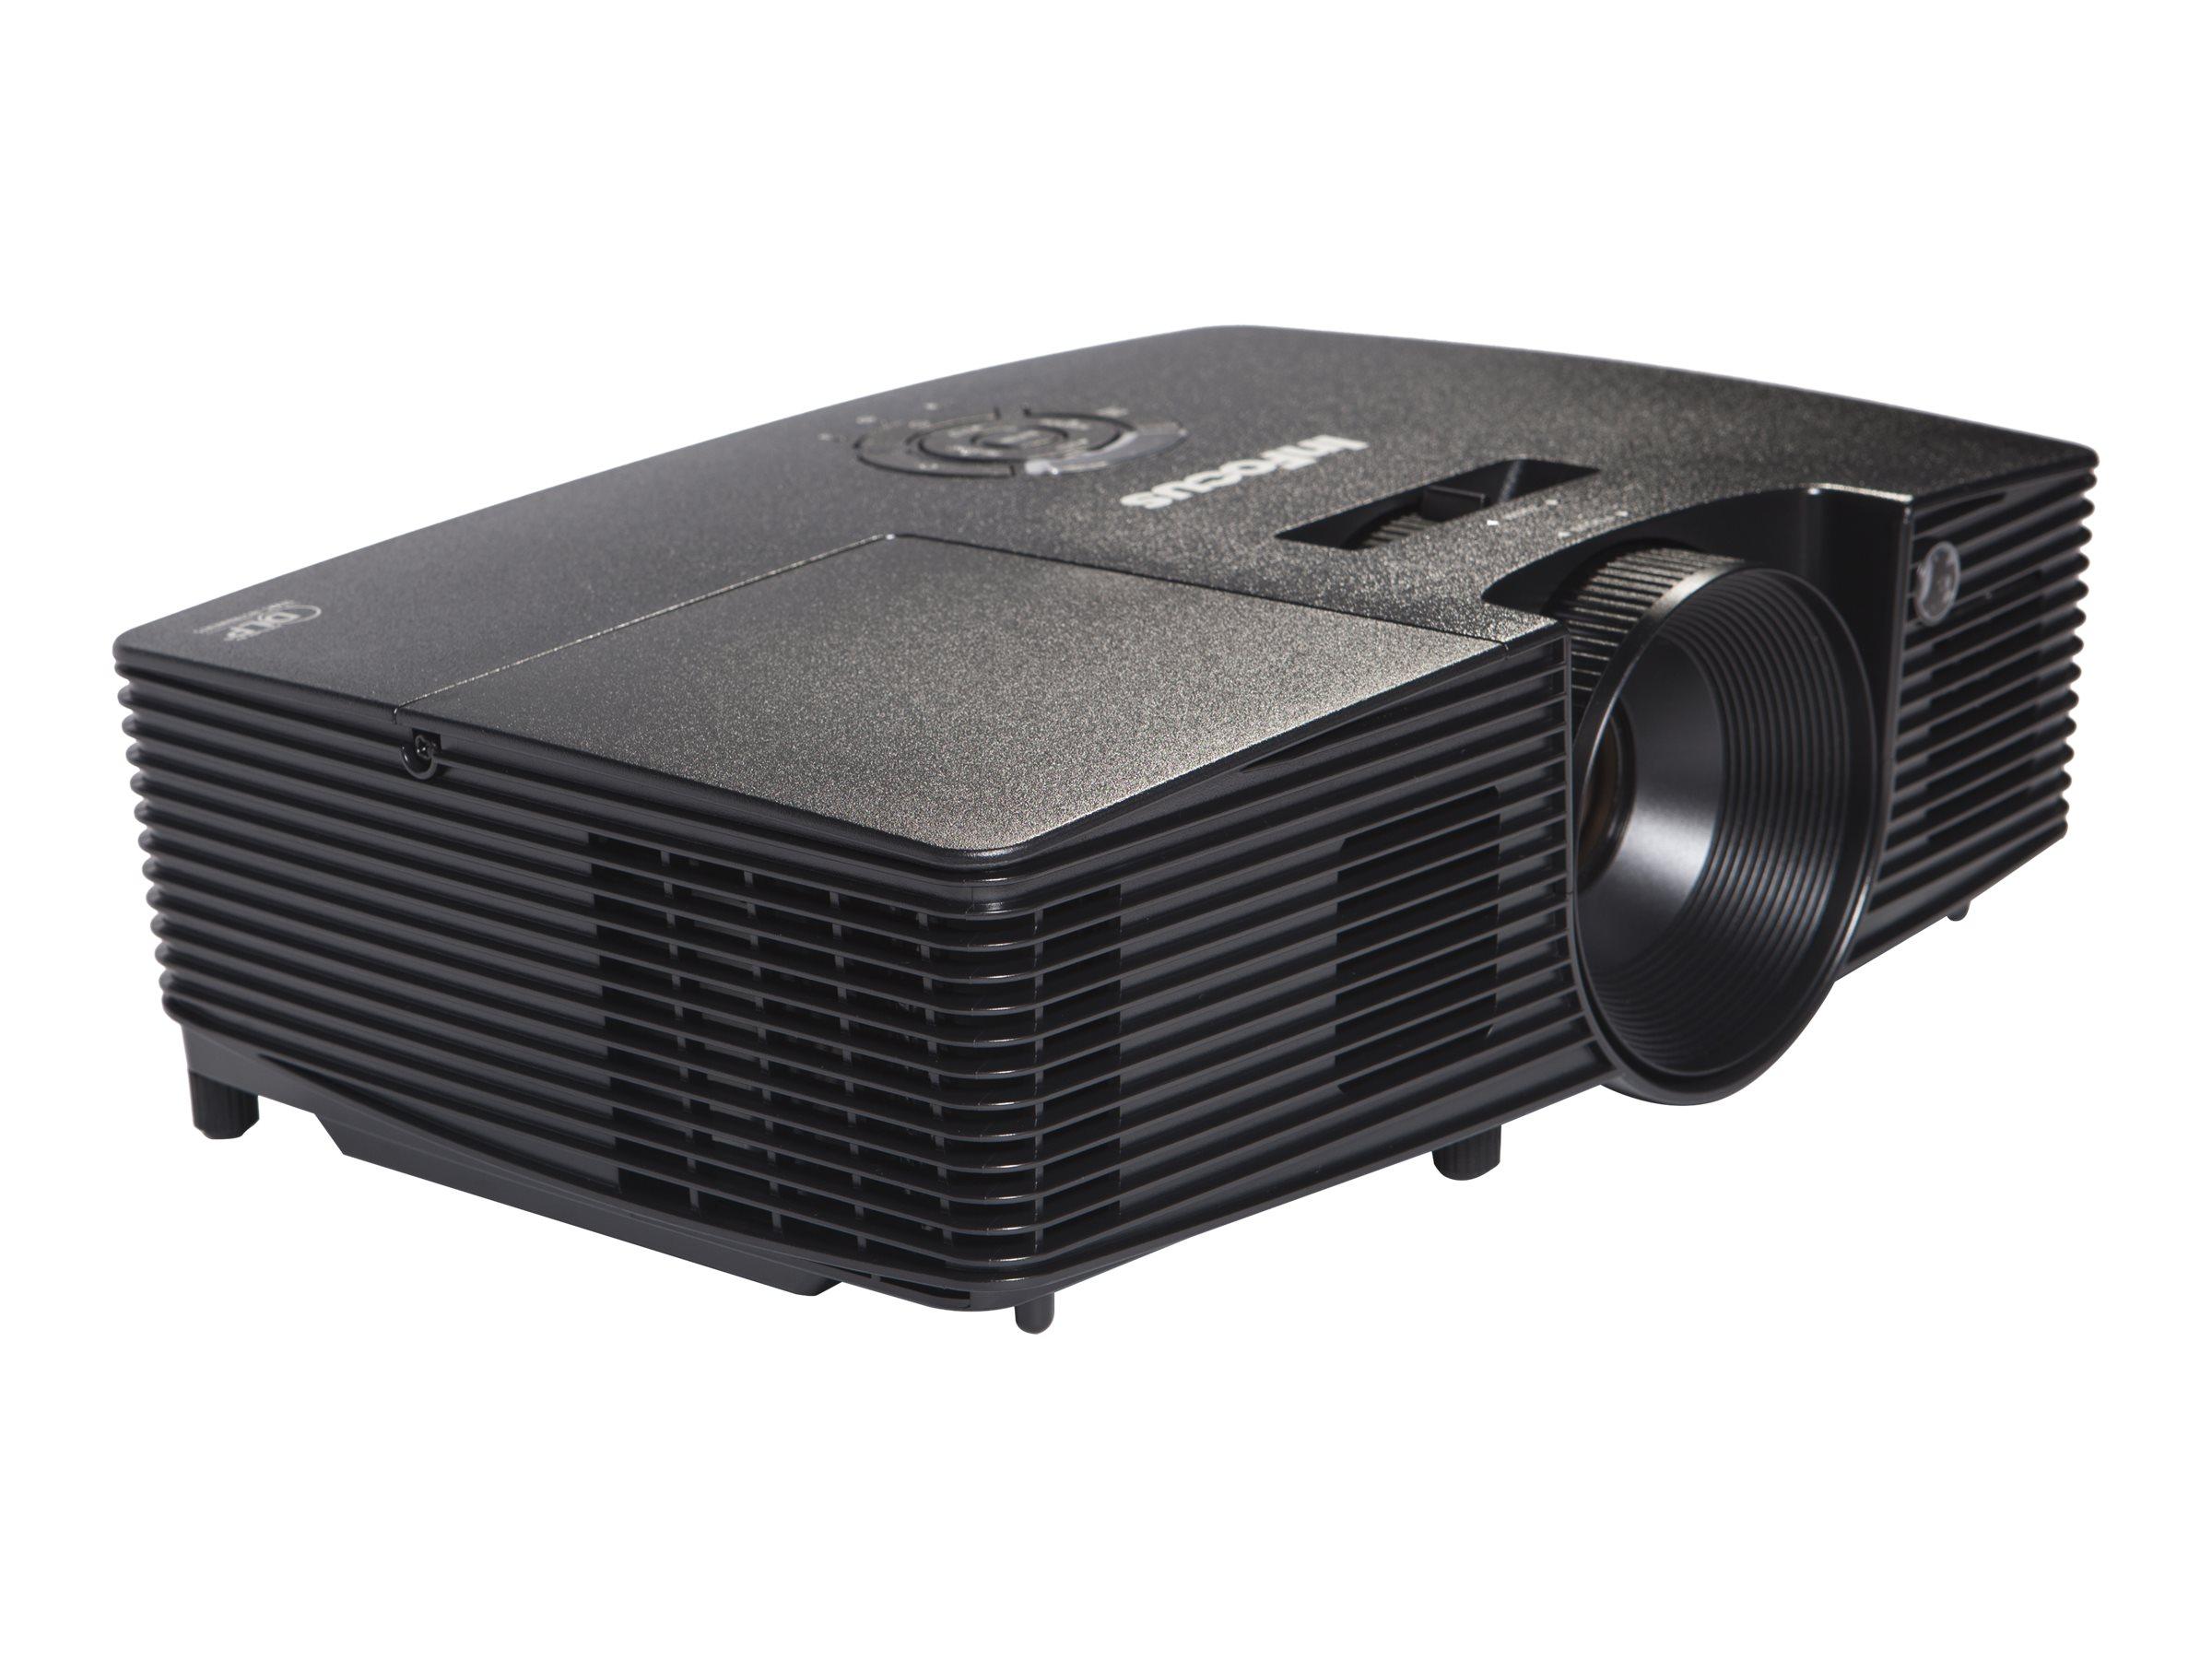 InFocus IN114xv - DLP projector - portable - 3D